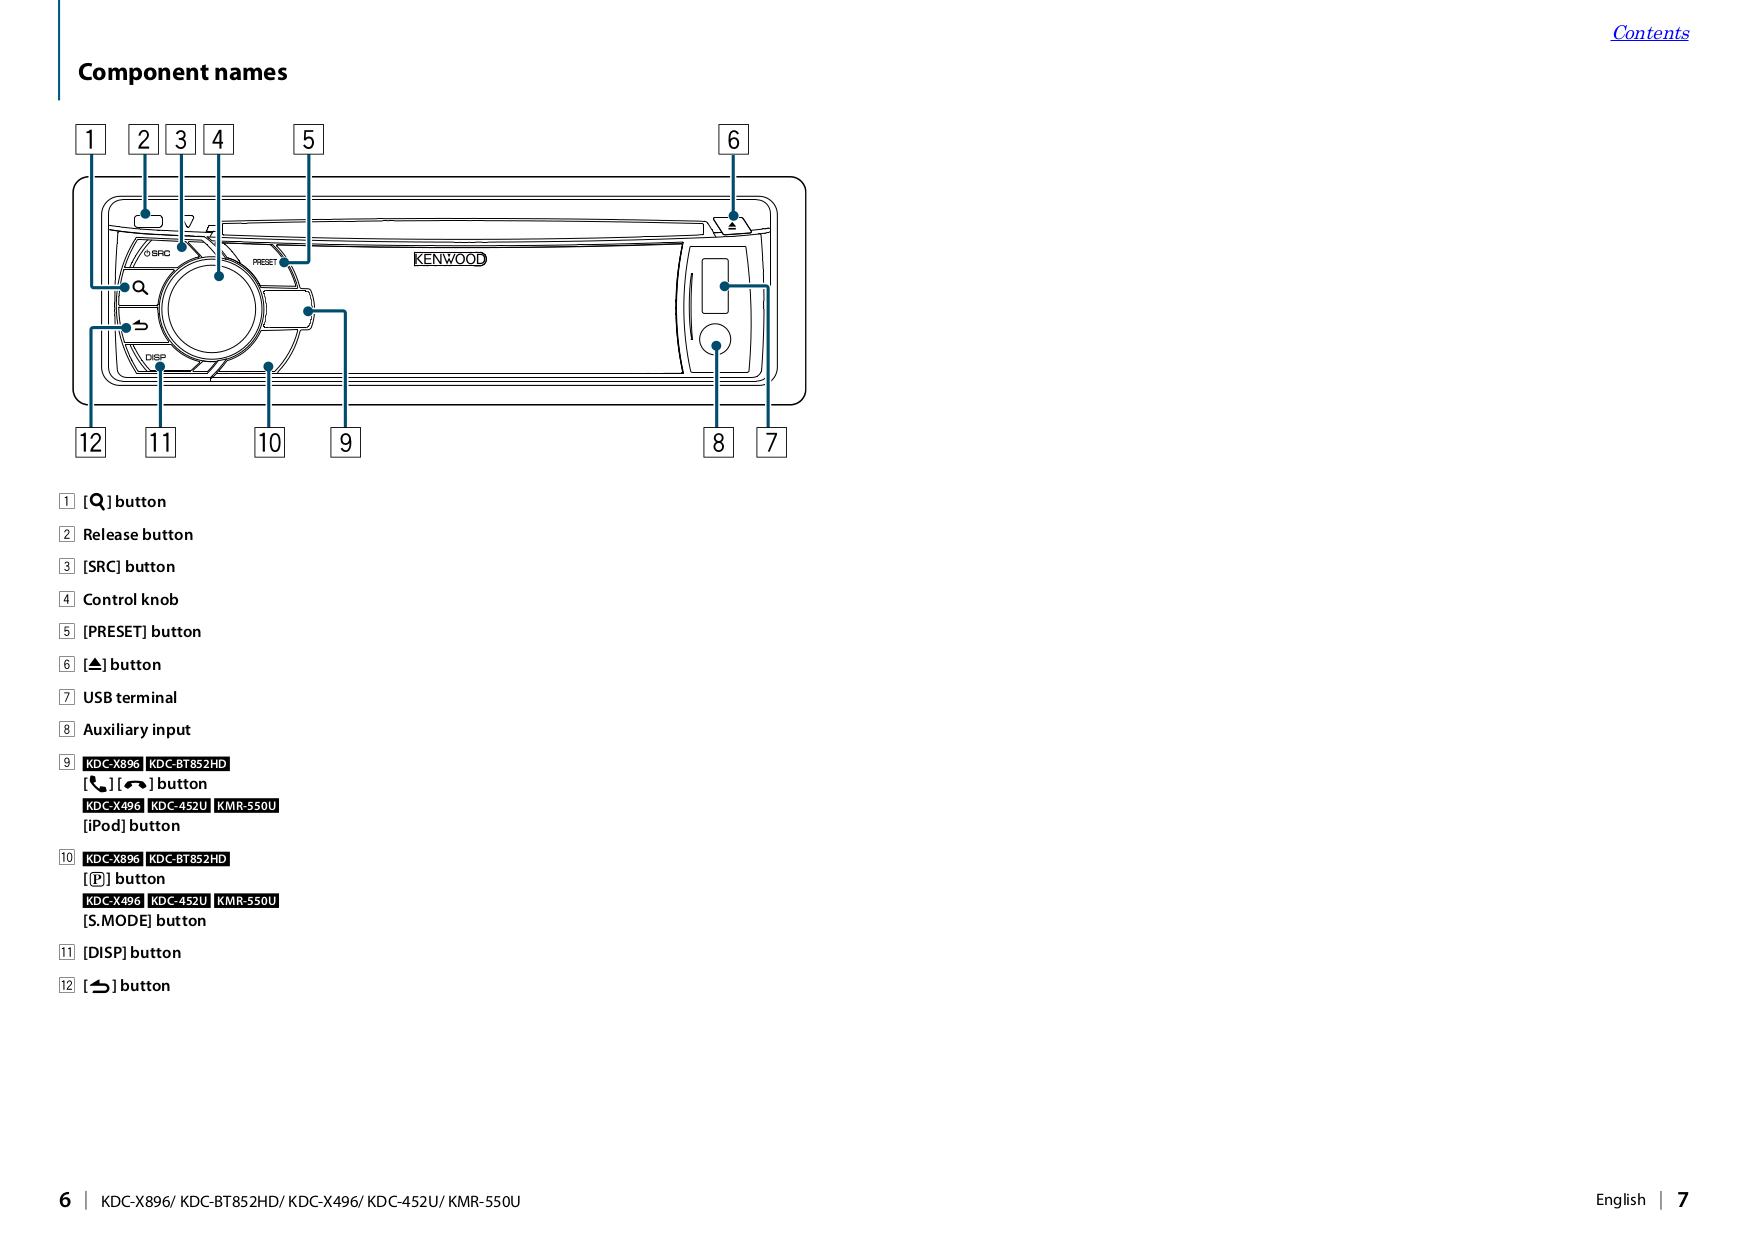 kenwood dpx308u wiring diagram clarion vx401 wiring Kenwood Model KDC Wiring -Diagram Kenwood Wiring Harness